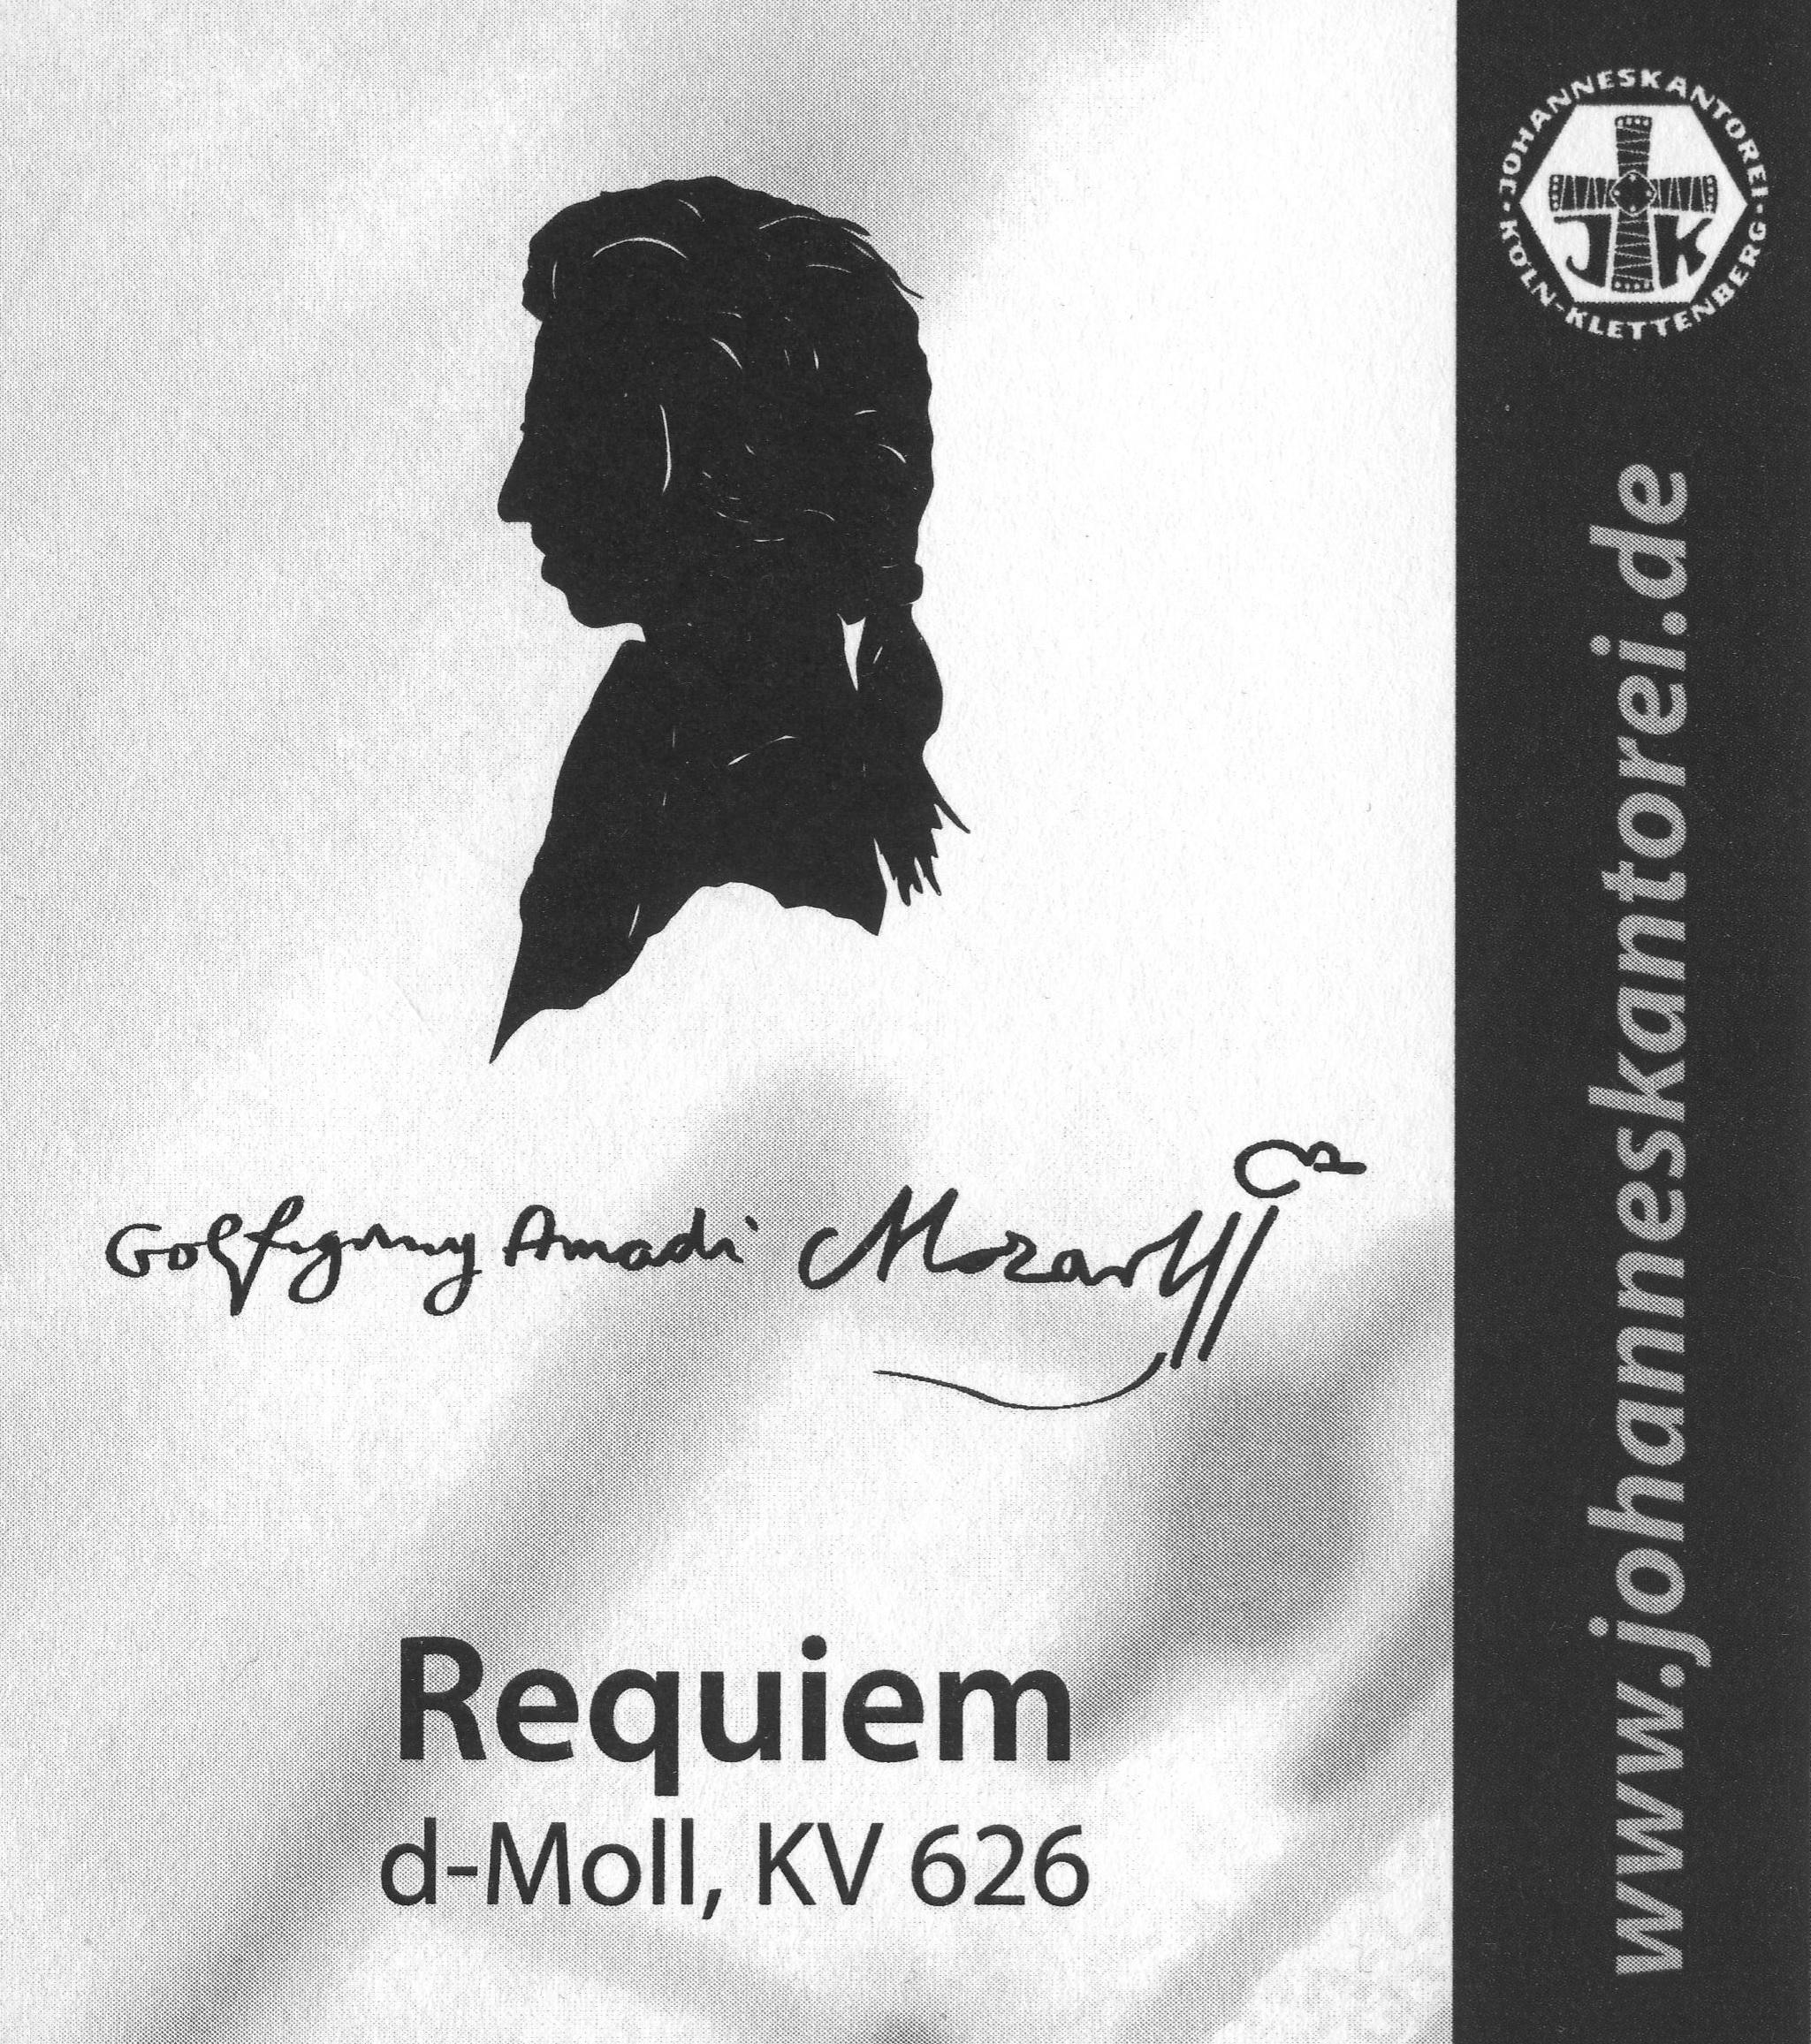 Requiem, d-Moll, KV 626, Wolfgang Amadeus Mozart